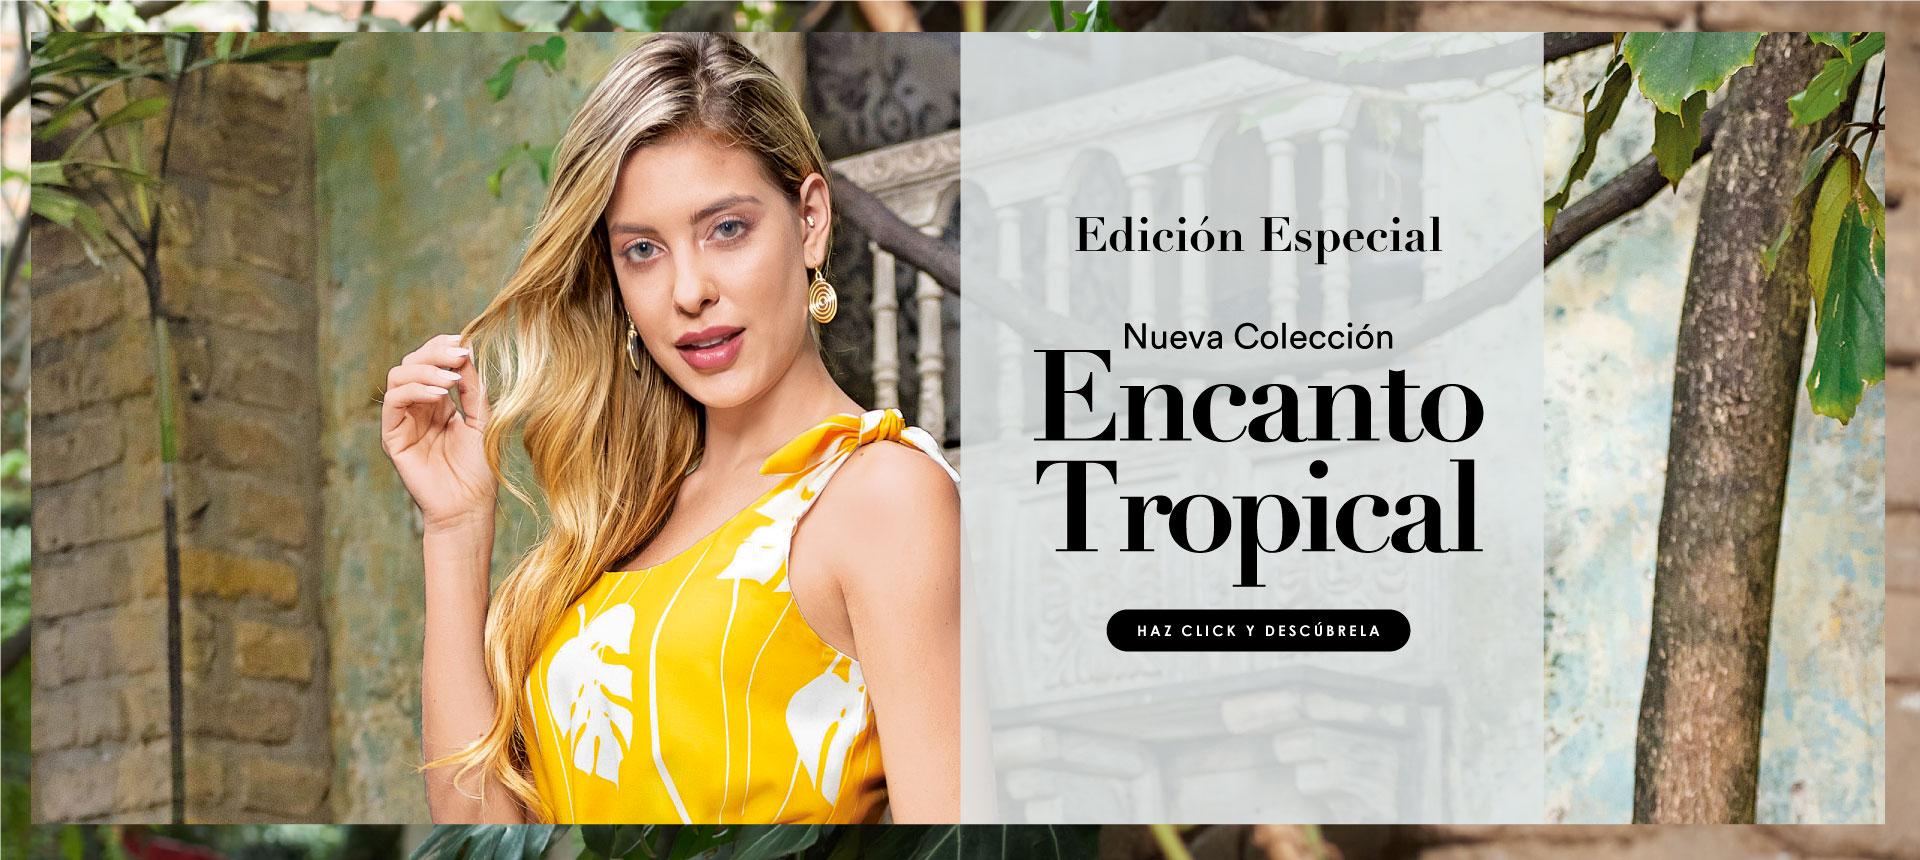 encanto tropical nueva colección ebba venta por catálogo